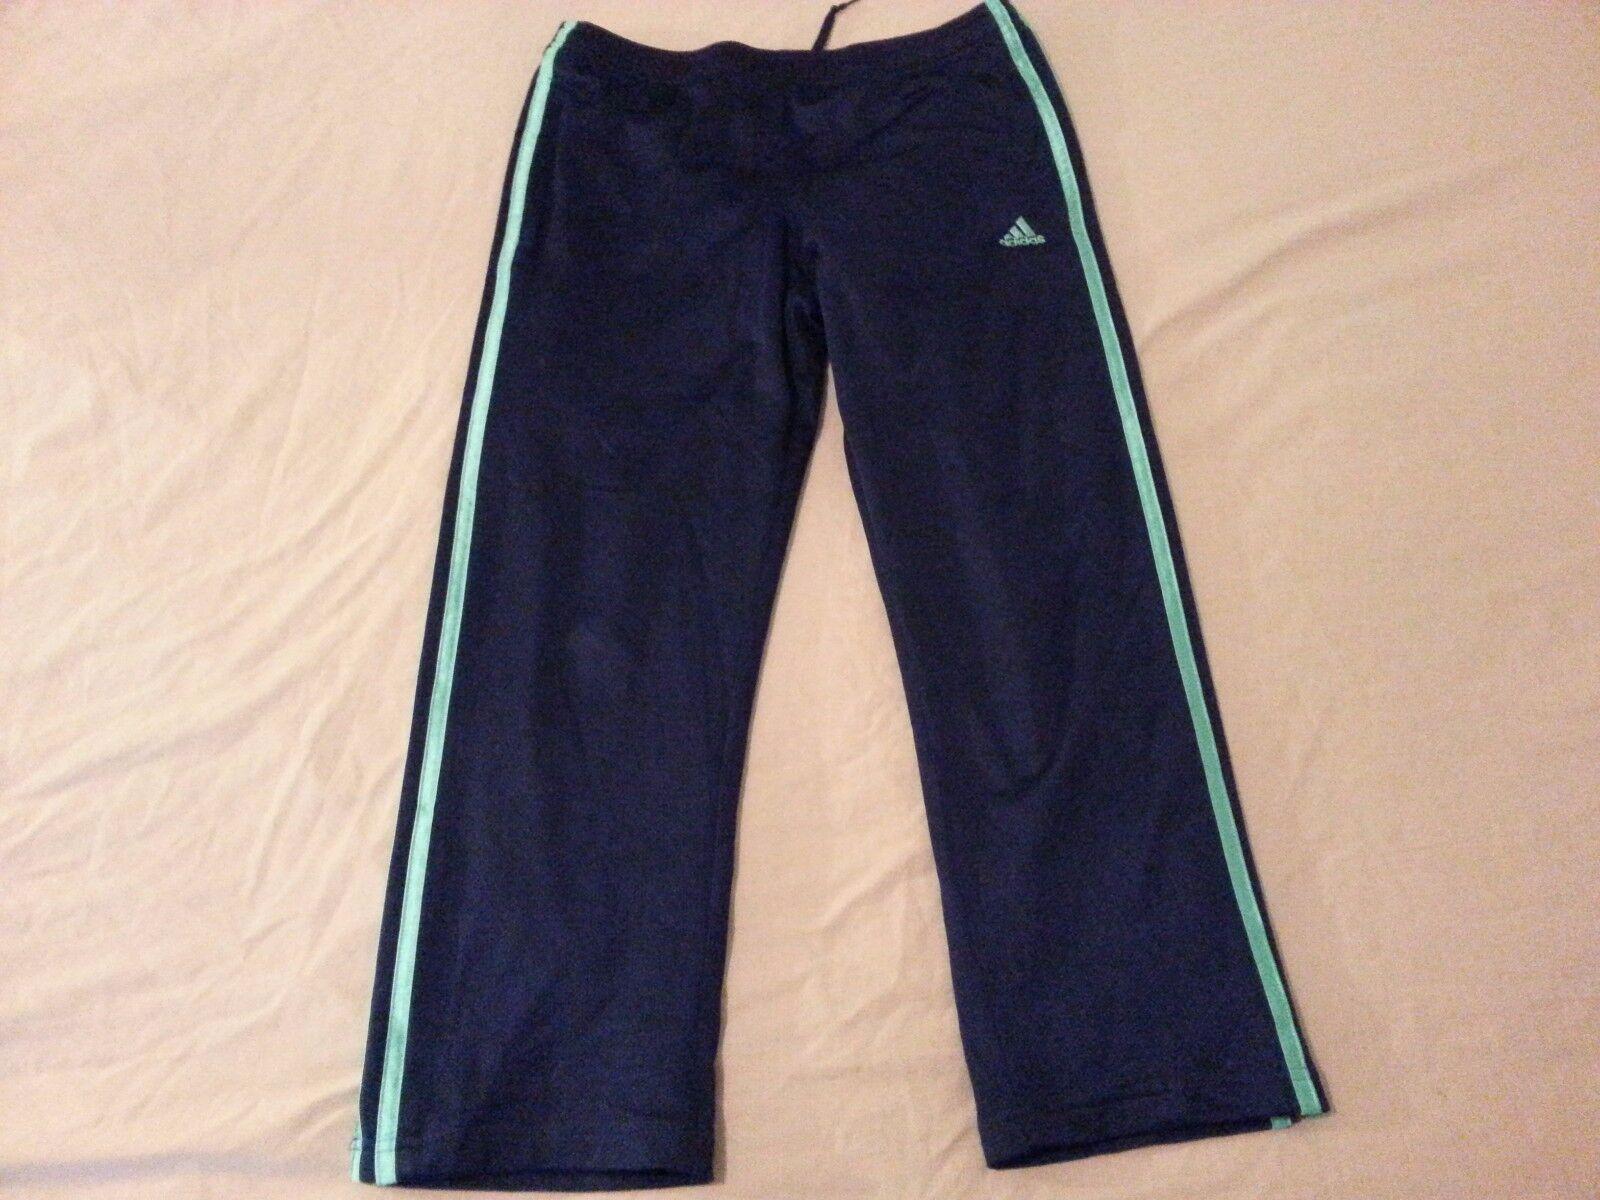 Pantalon adidas Femme Capri S Small Bleu Marine Athletic